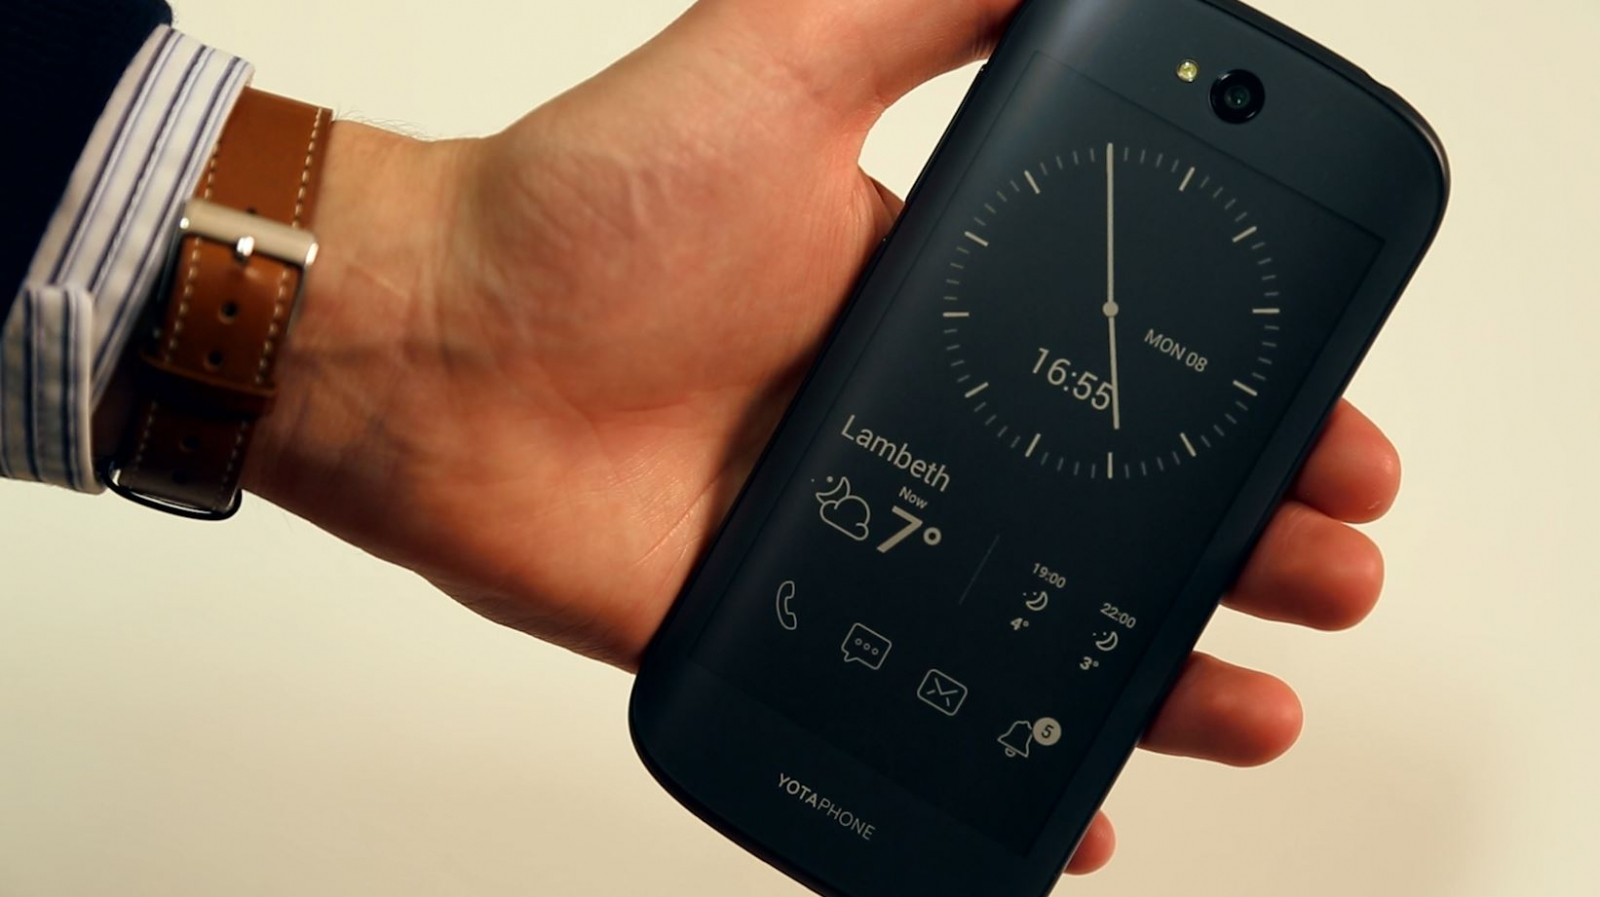 Yotaphone: Are dual-screened smartphones the future?